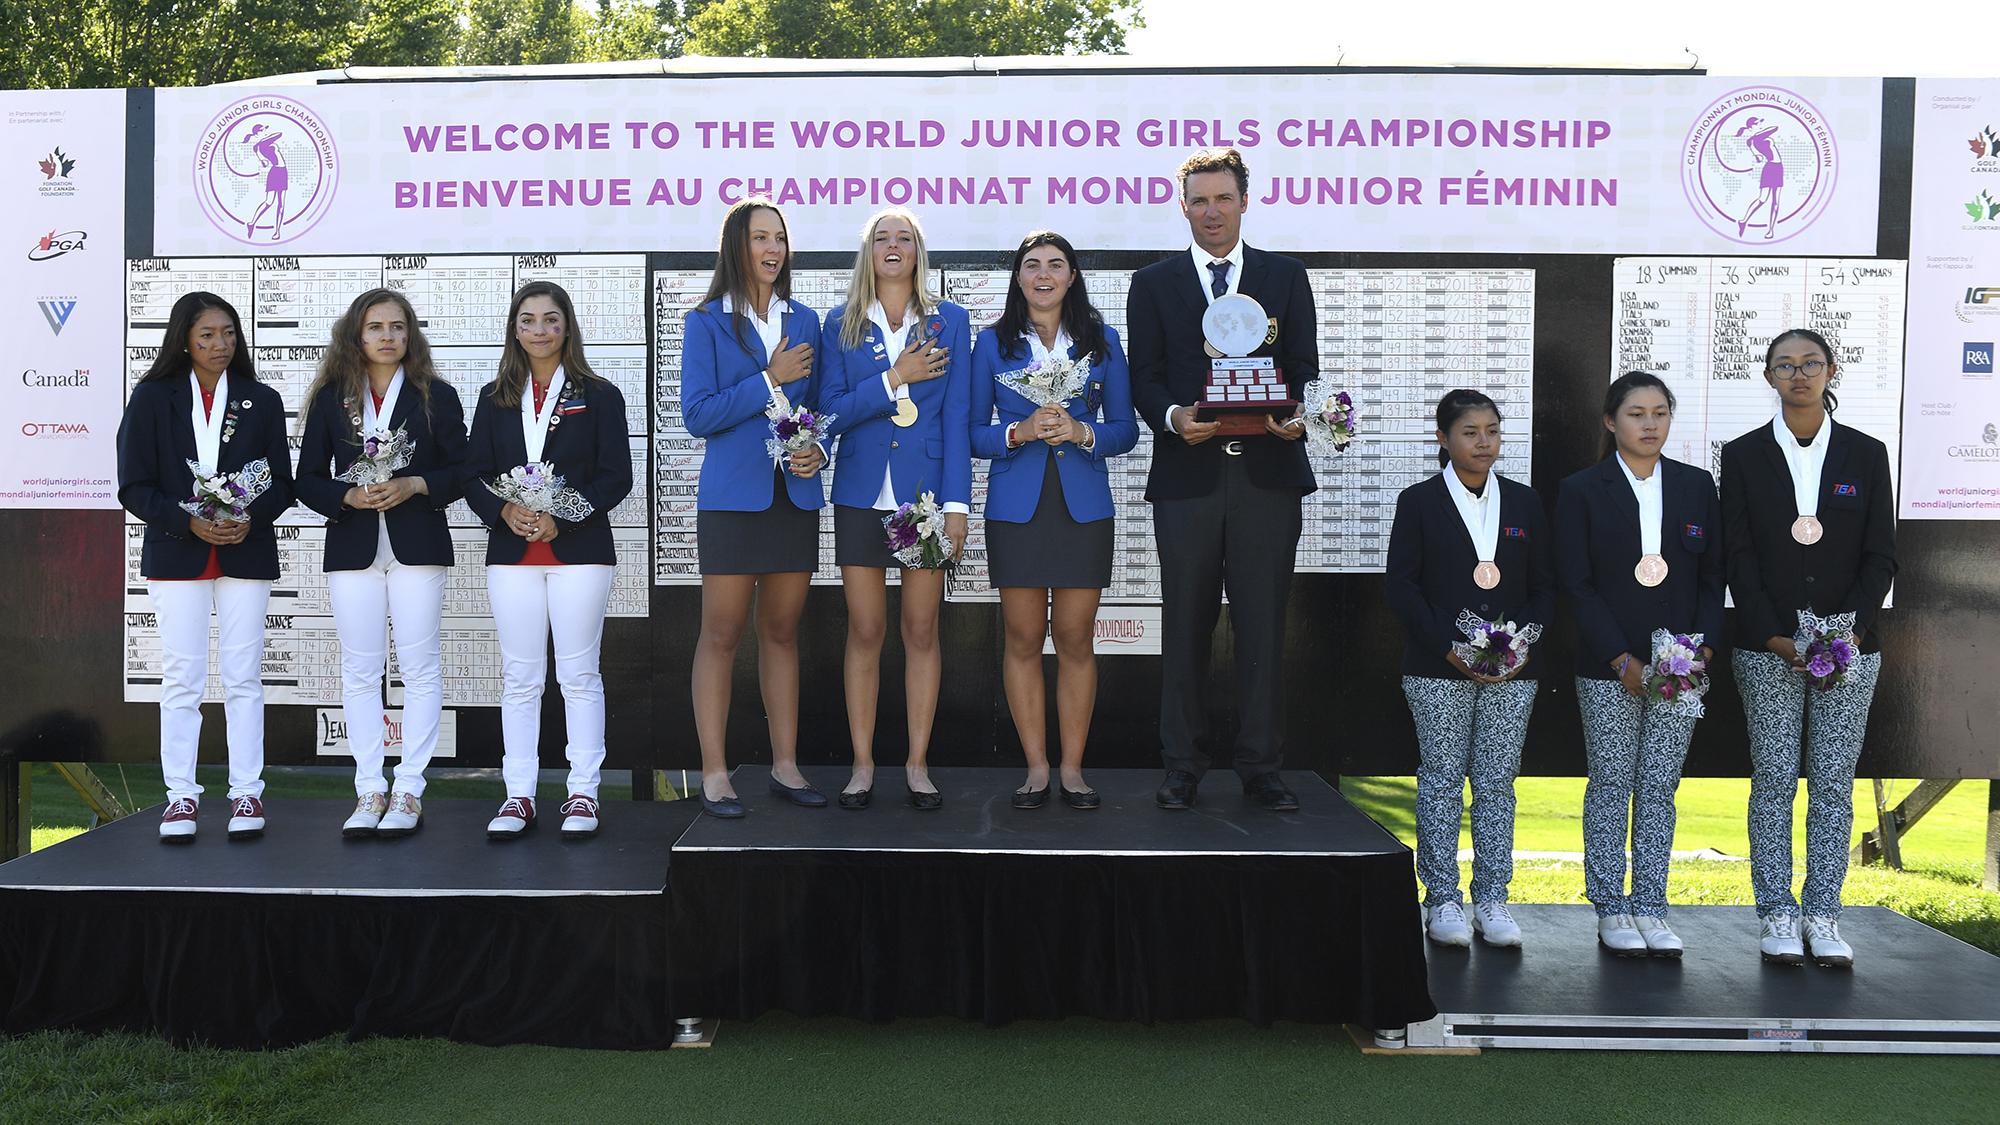 2018 World Junior Girls Championship